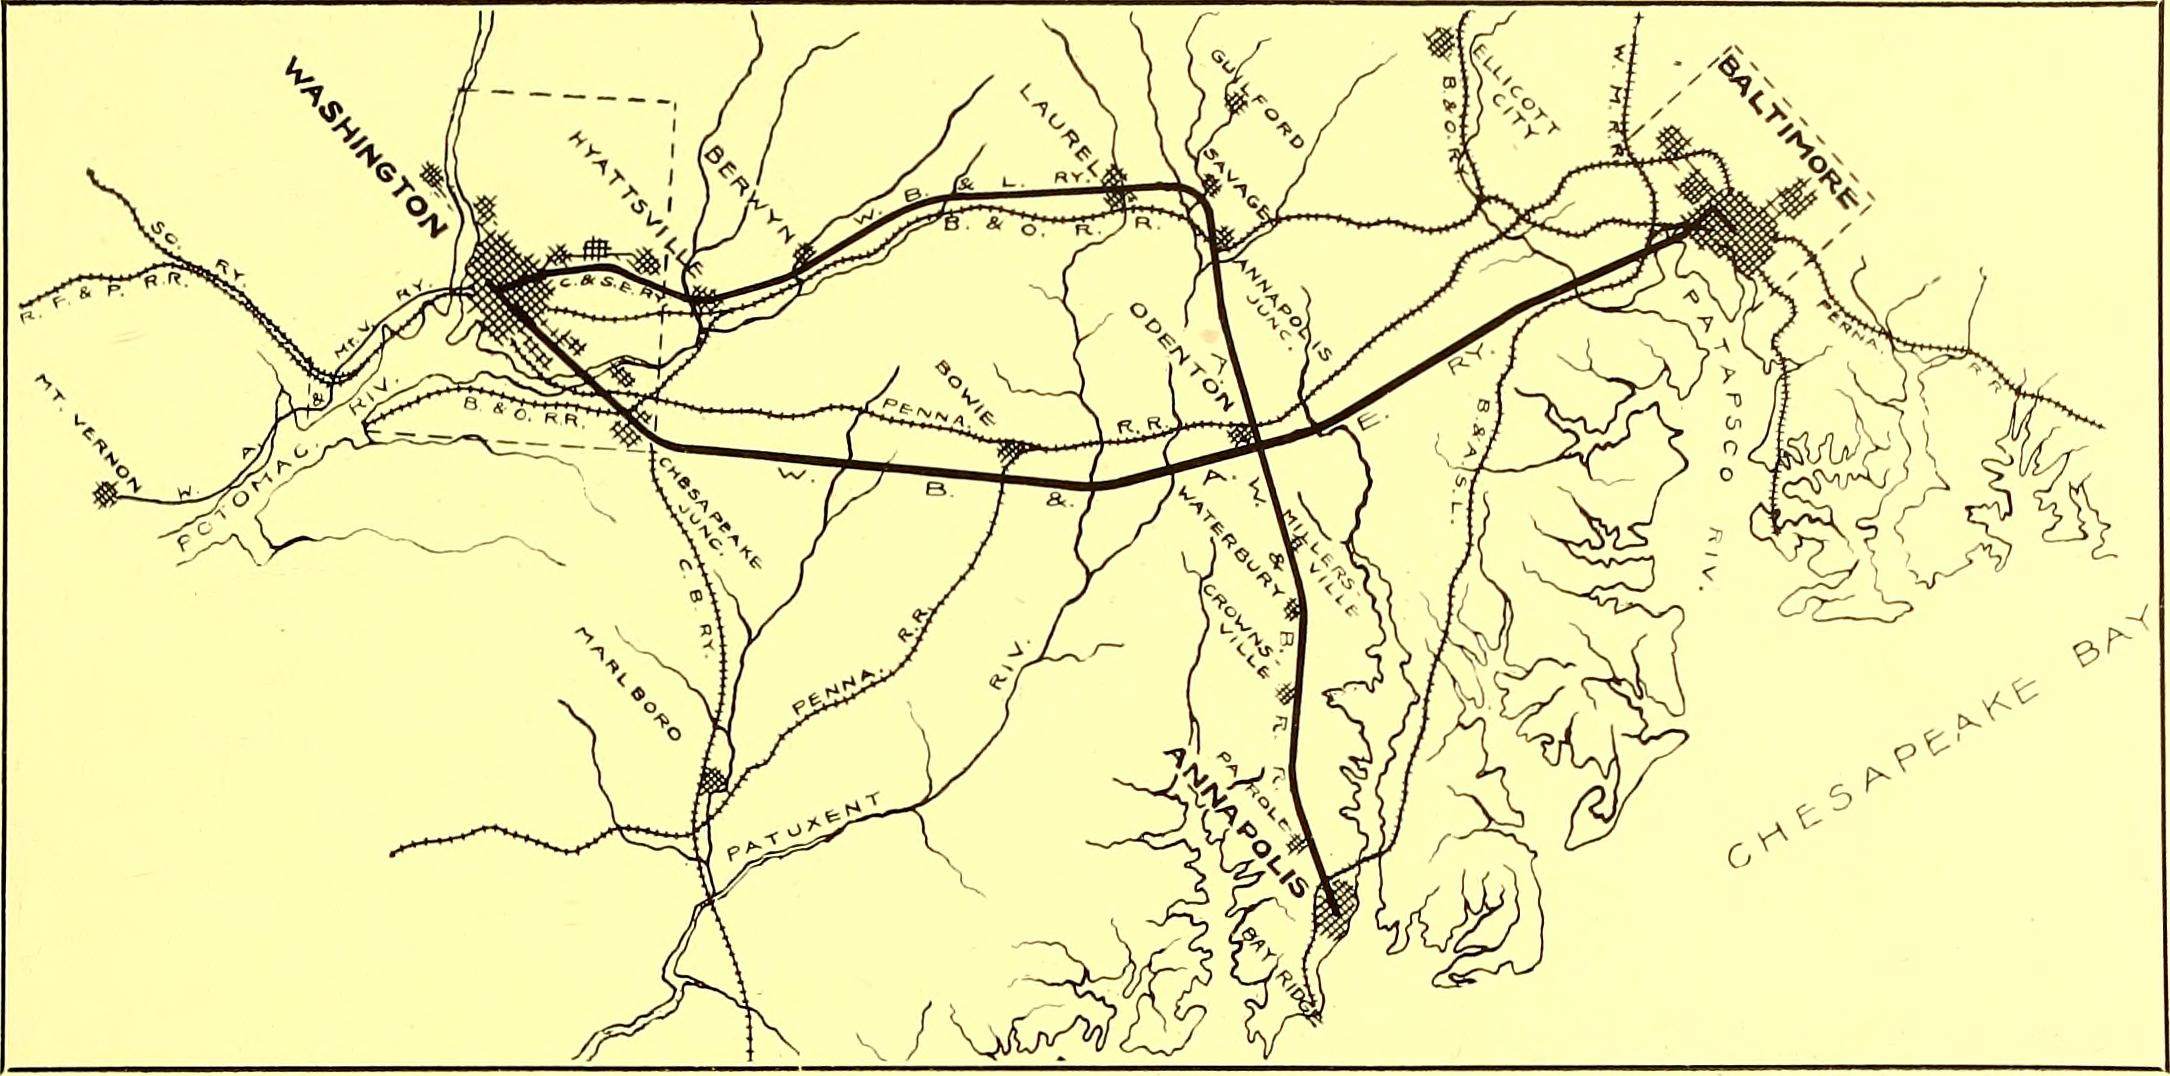 Baltimore-and-Annapolis-Railroad-Map-1884.jpg